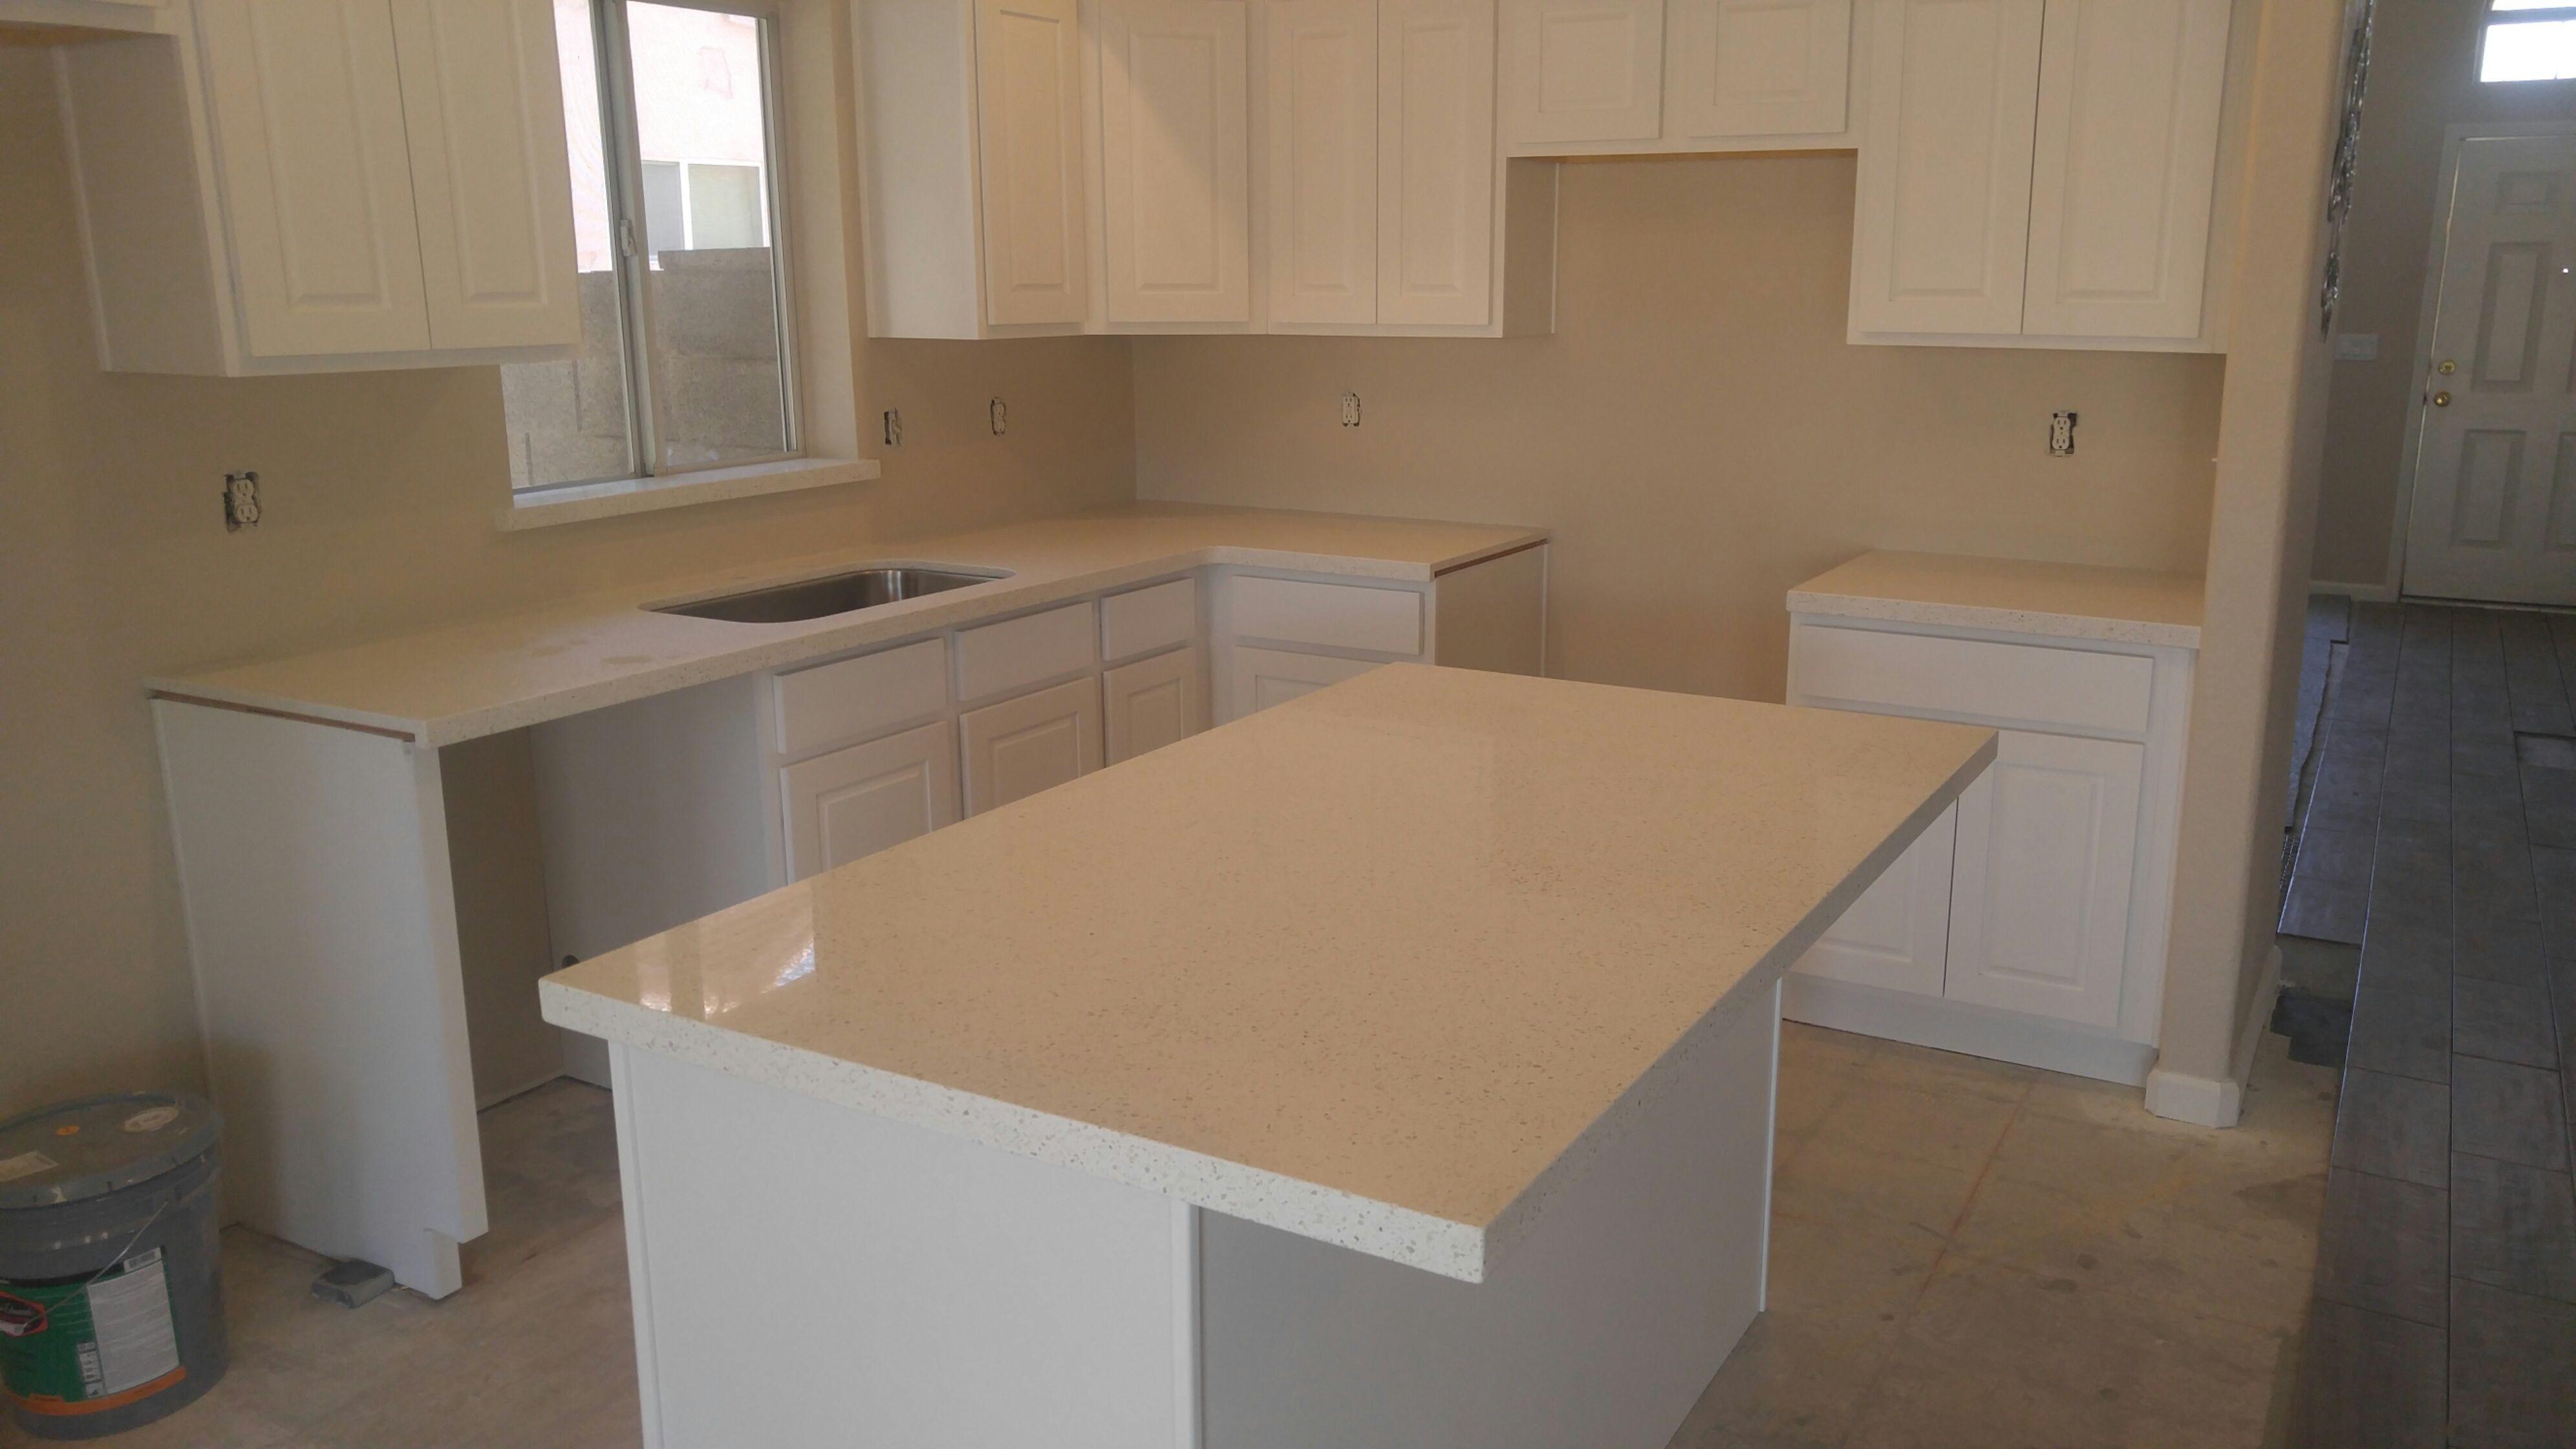 East Valley Quartz Countertops Mesa Gilbert Chandler Az Countertops Quartz Kitchen Countertops Quartz Kitchen